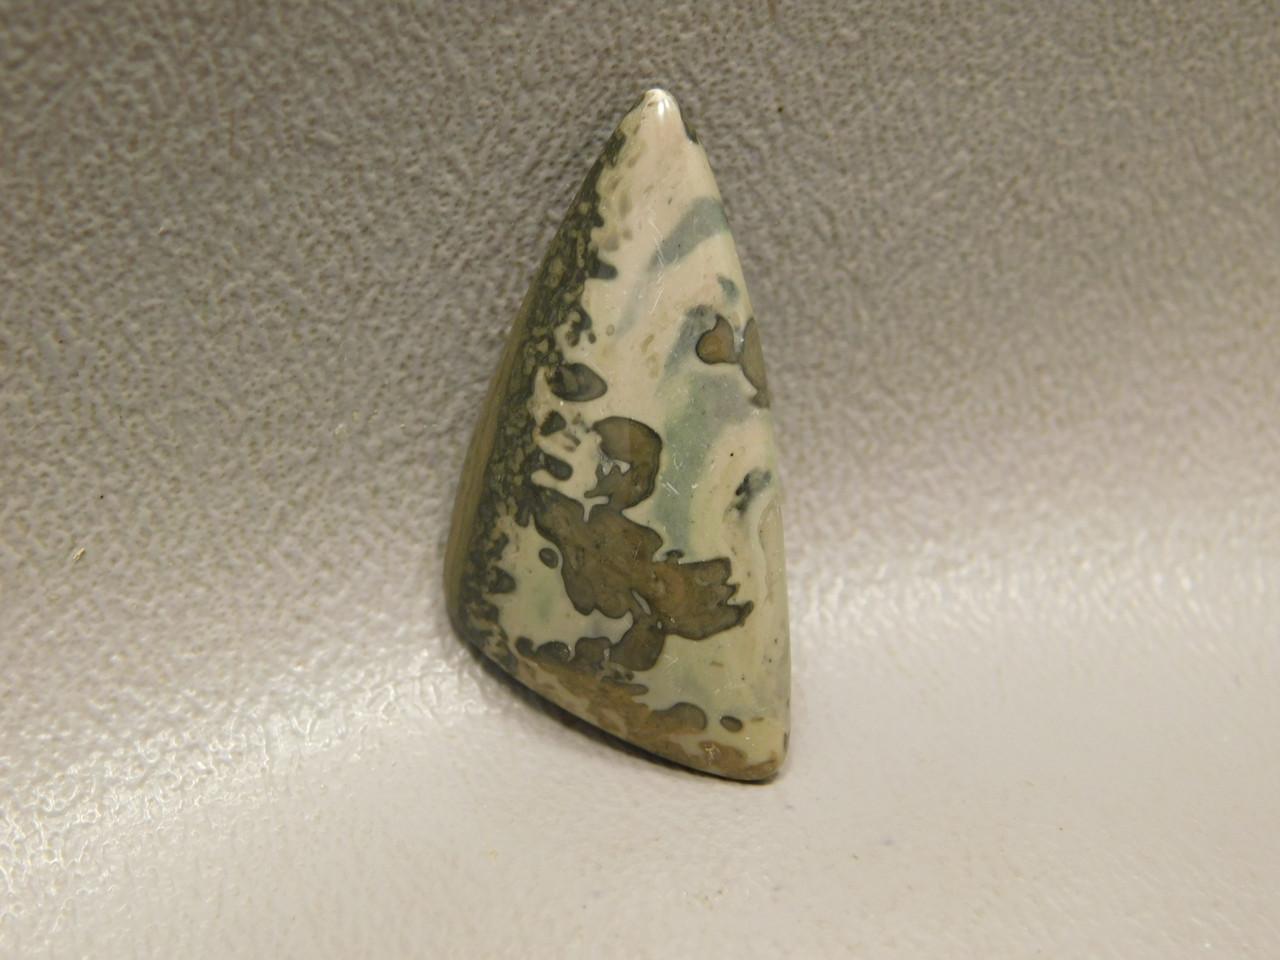 Cotham Marble Cabochon Fossil Stromatolite #24